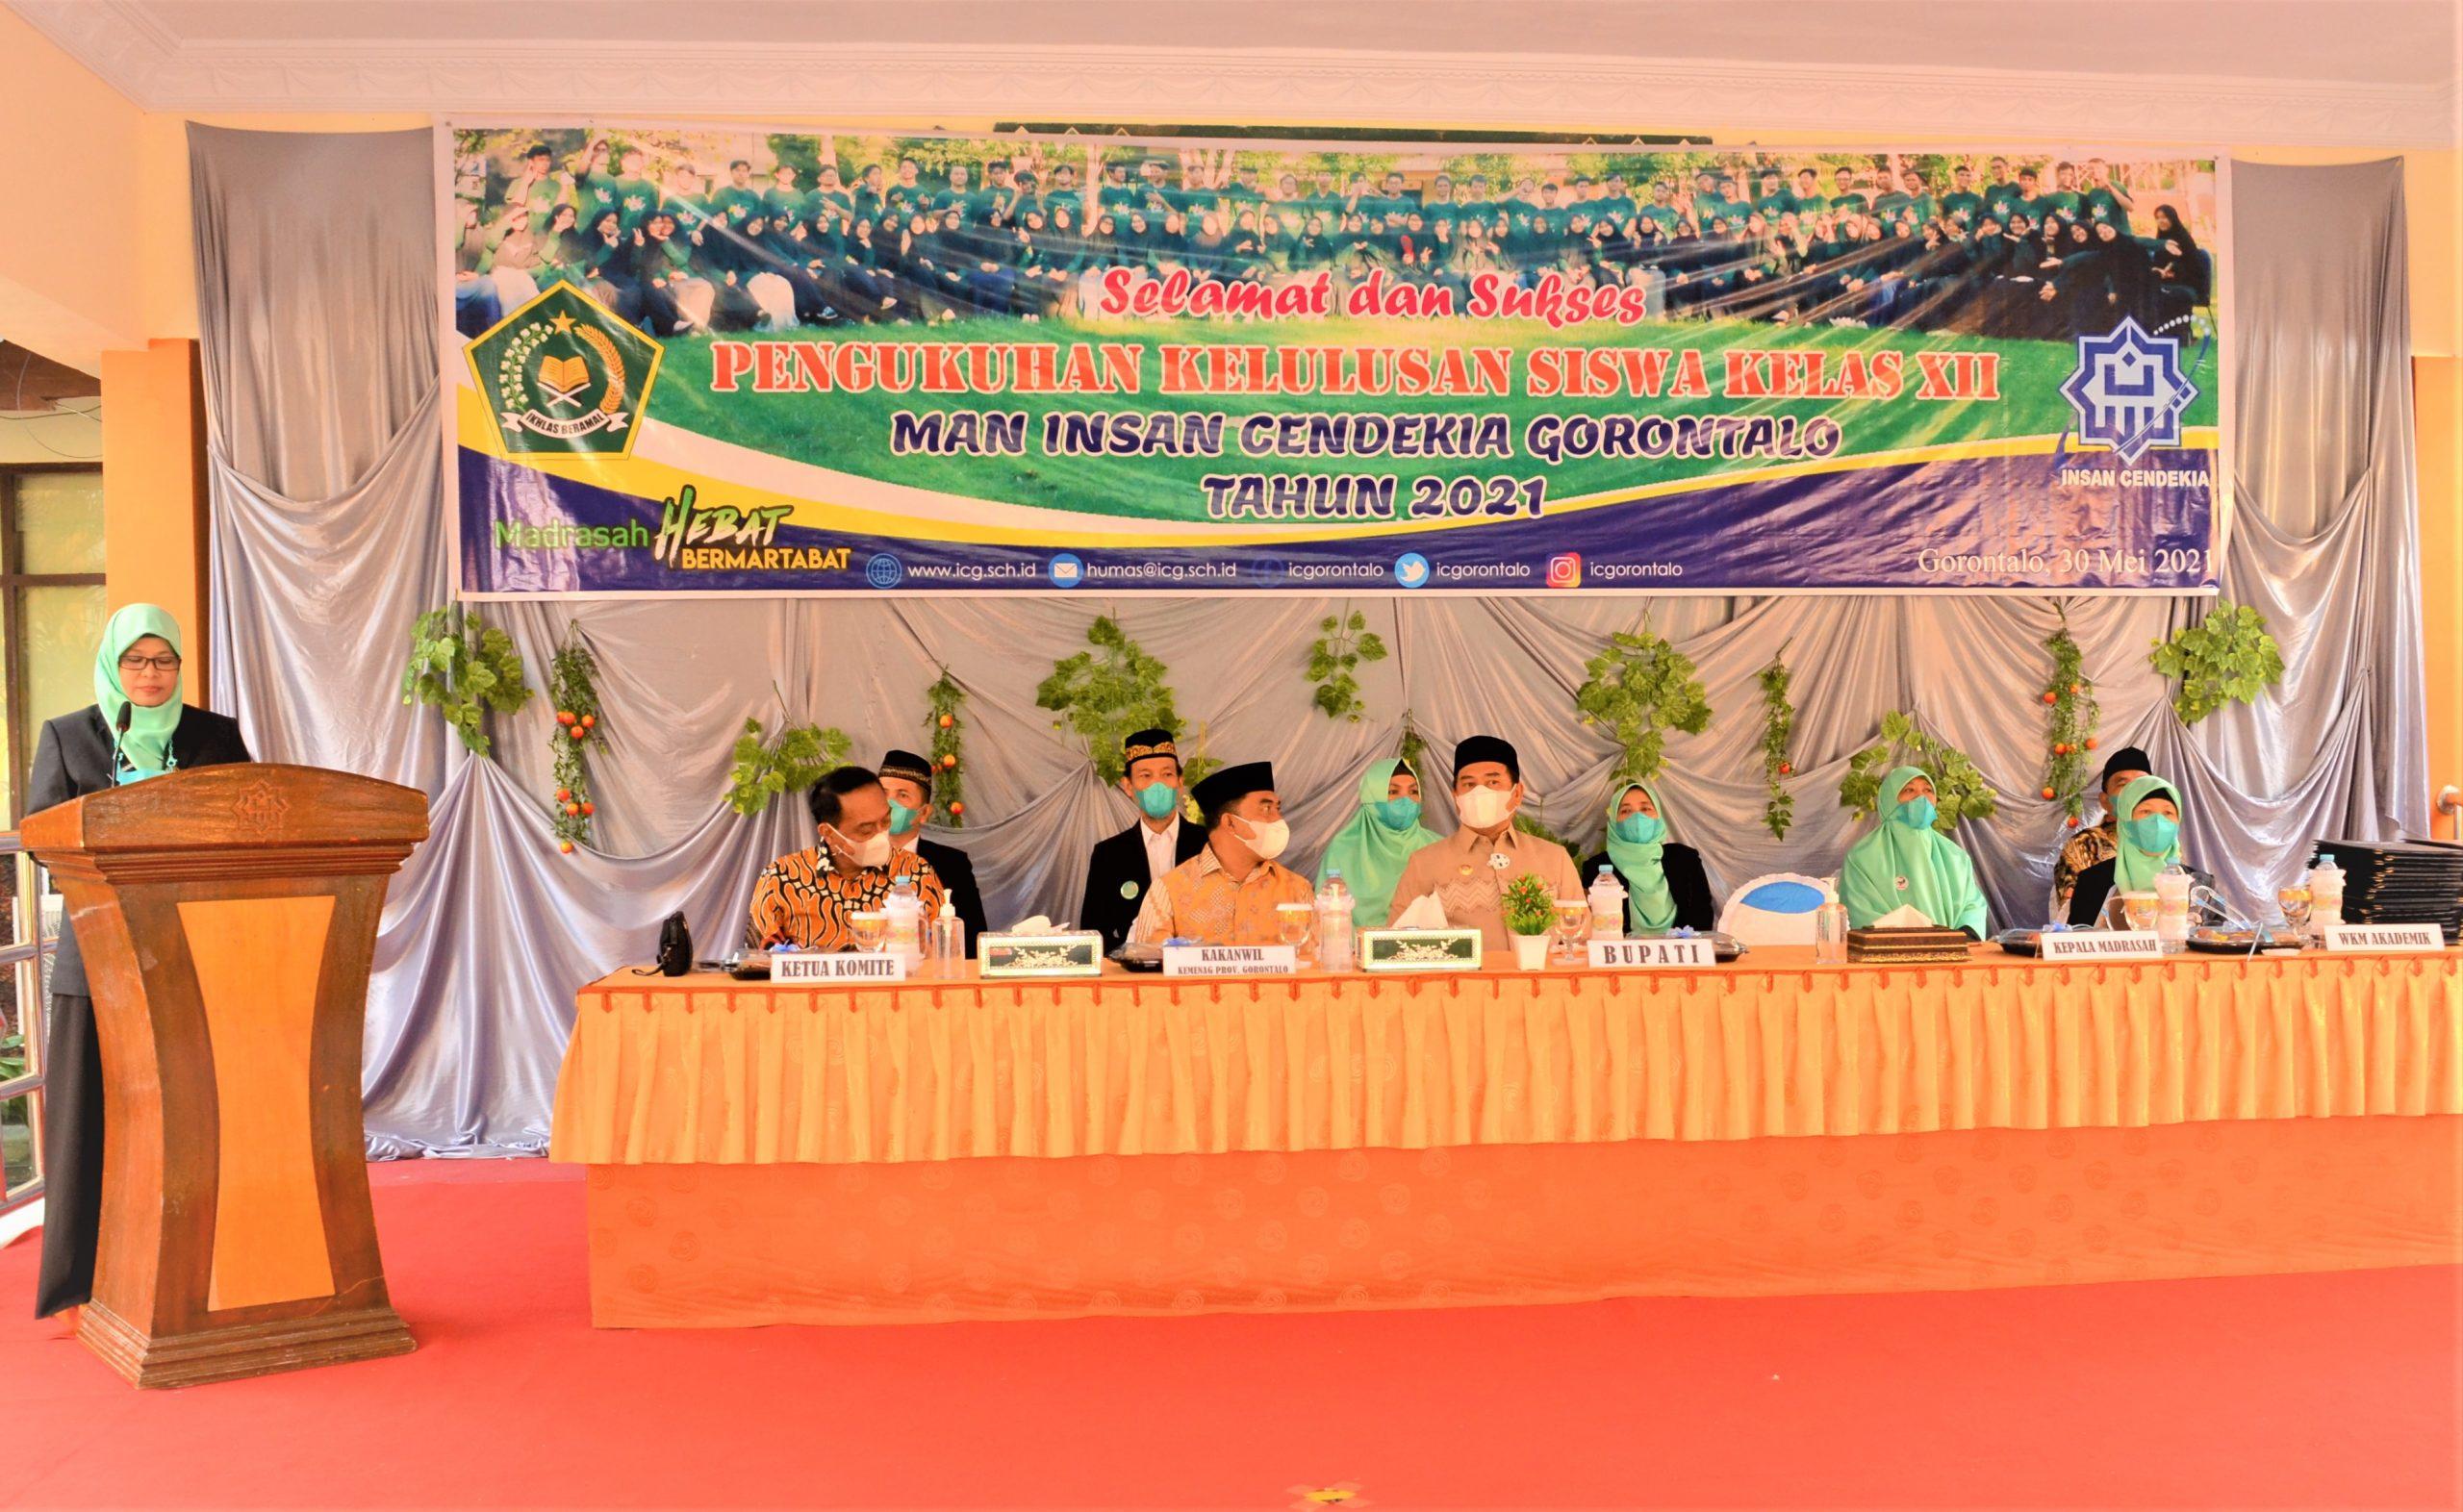 Wisuda Angkatan 22 MAN IC Gorontalo, Direktur KSKK Beri Amanat